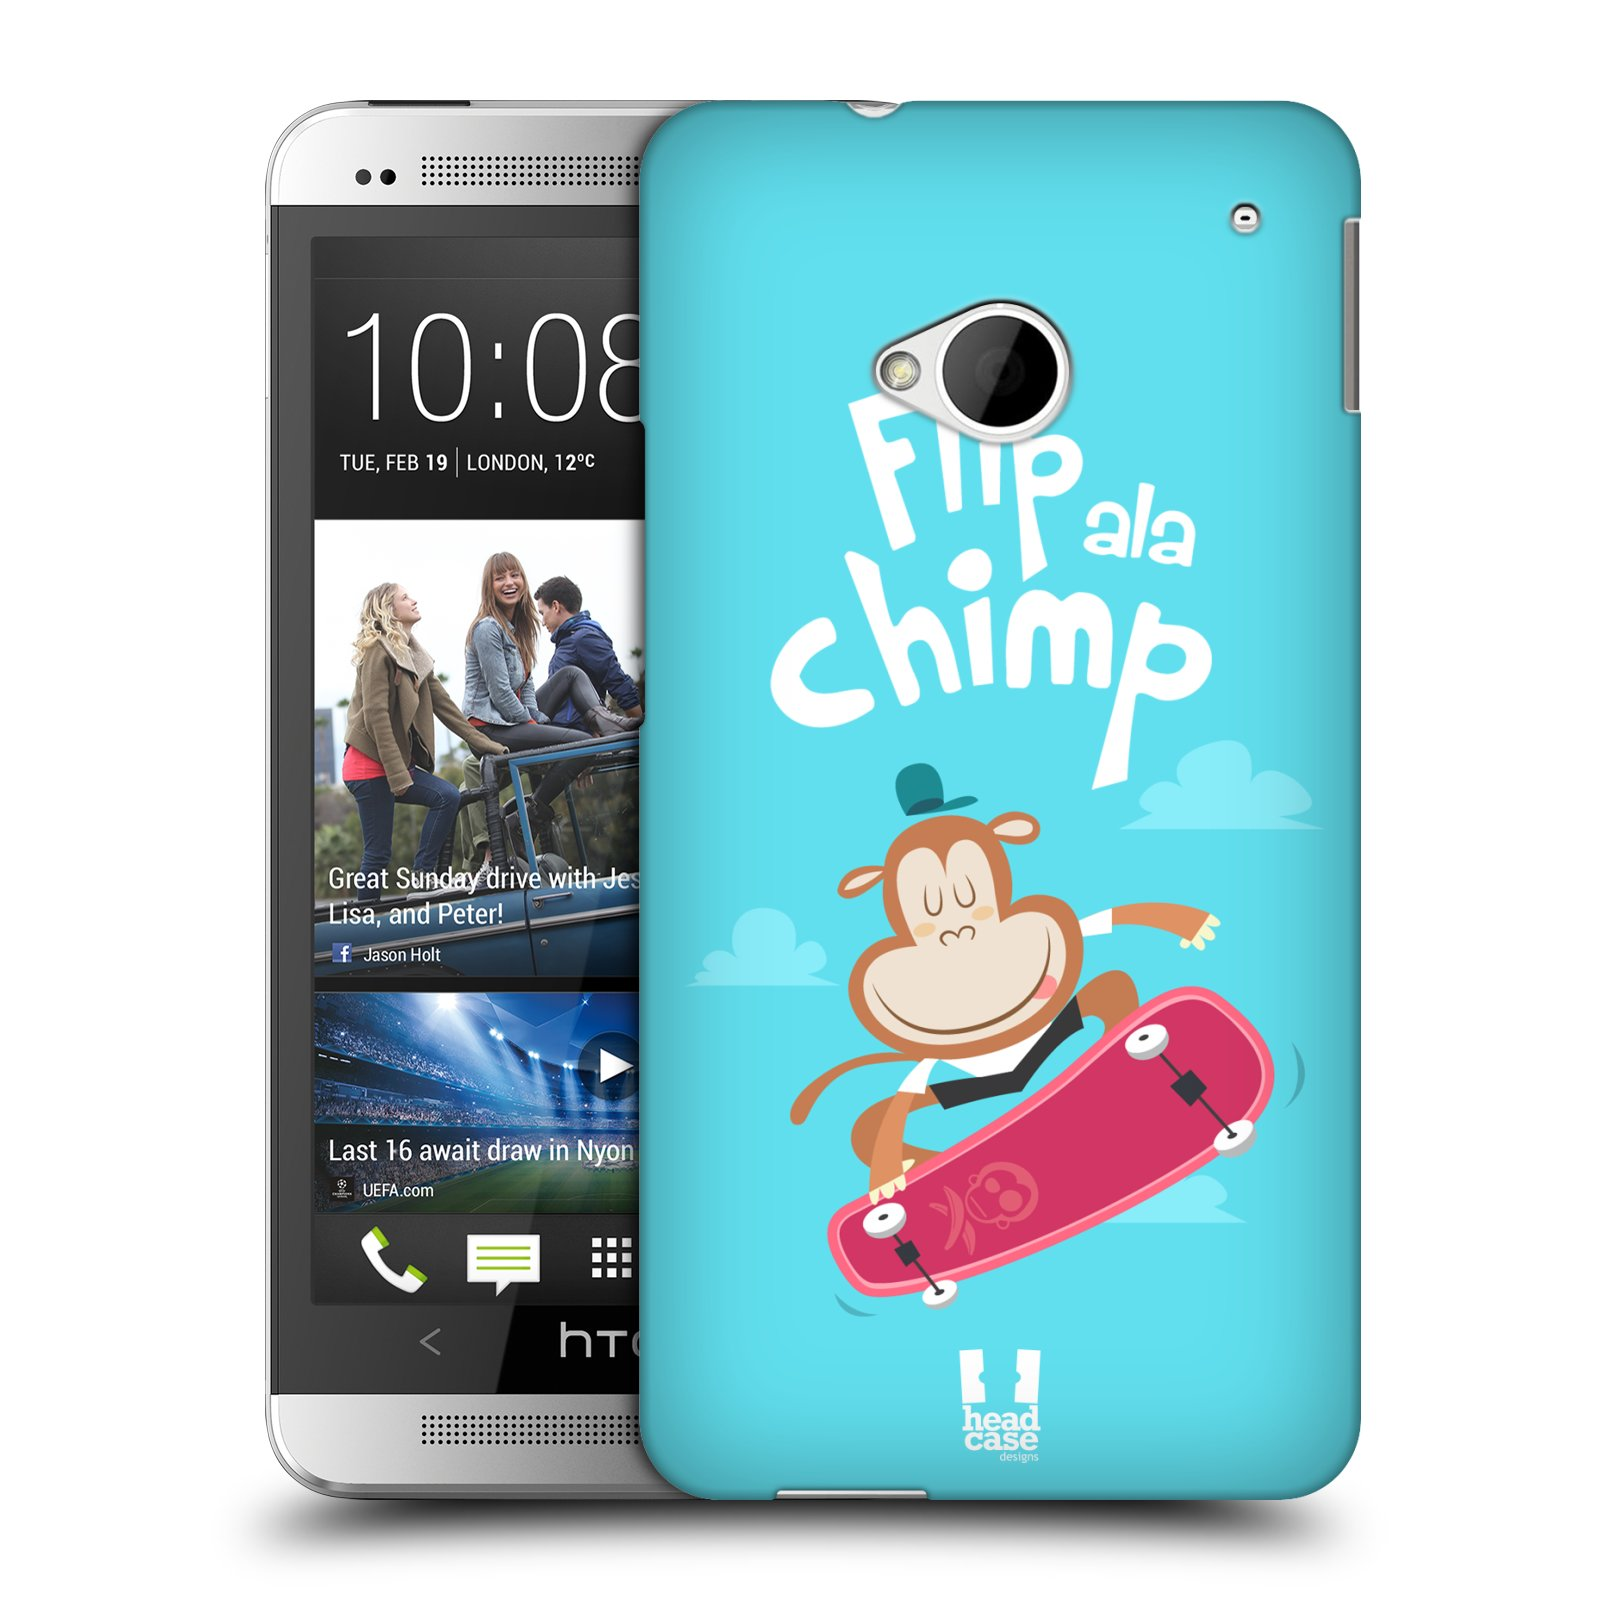 HEAD CASE plastový obal na mobil HTC One (M7) vzor Zvířátka atleti opice